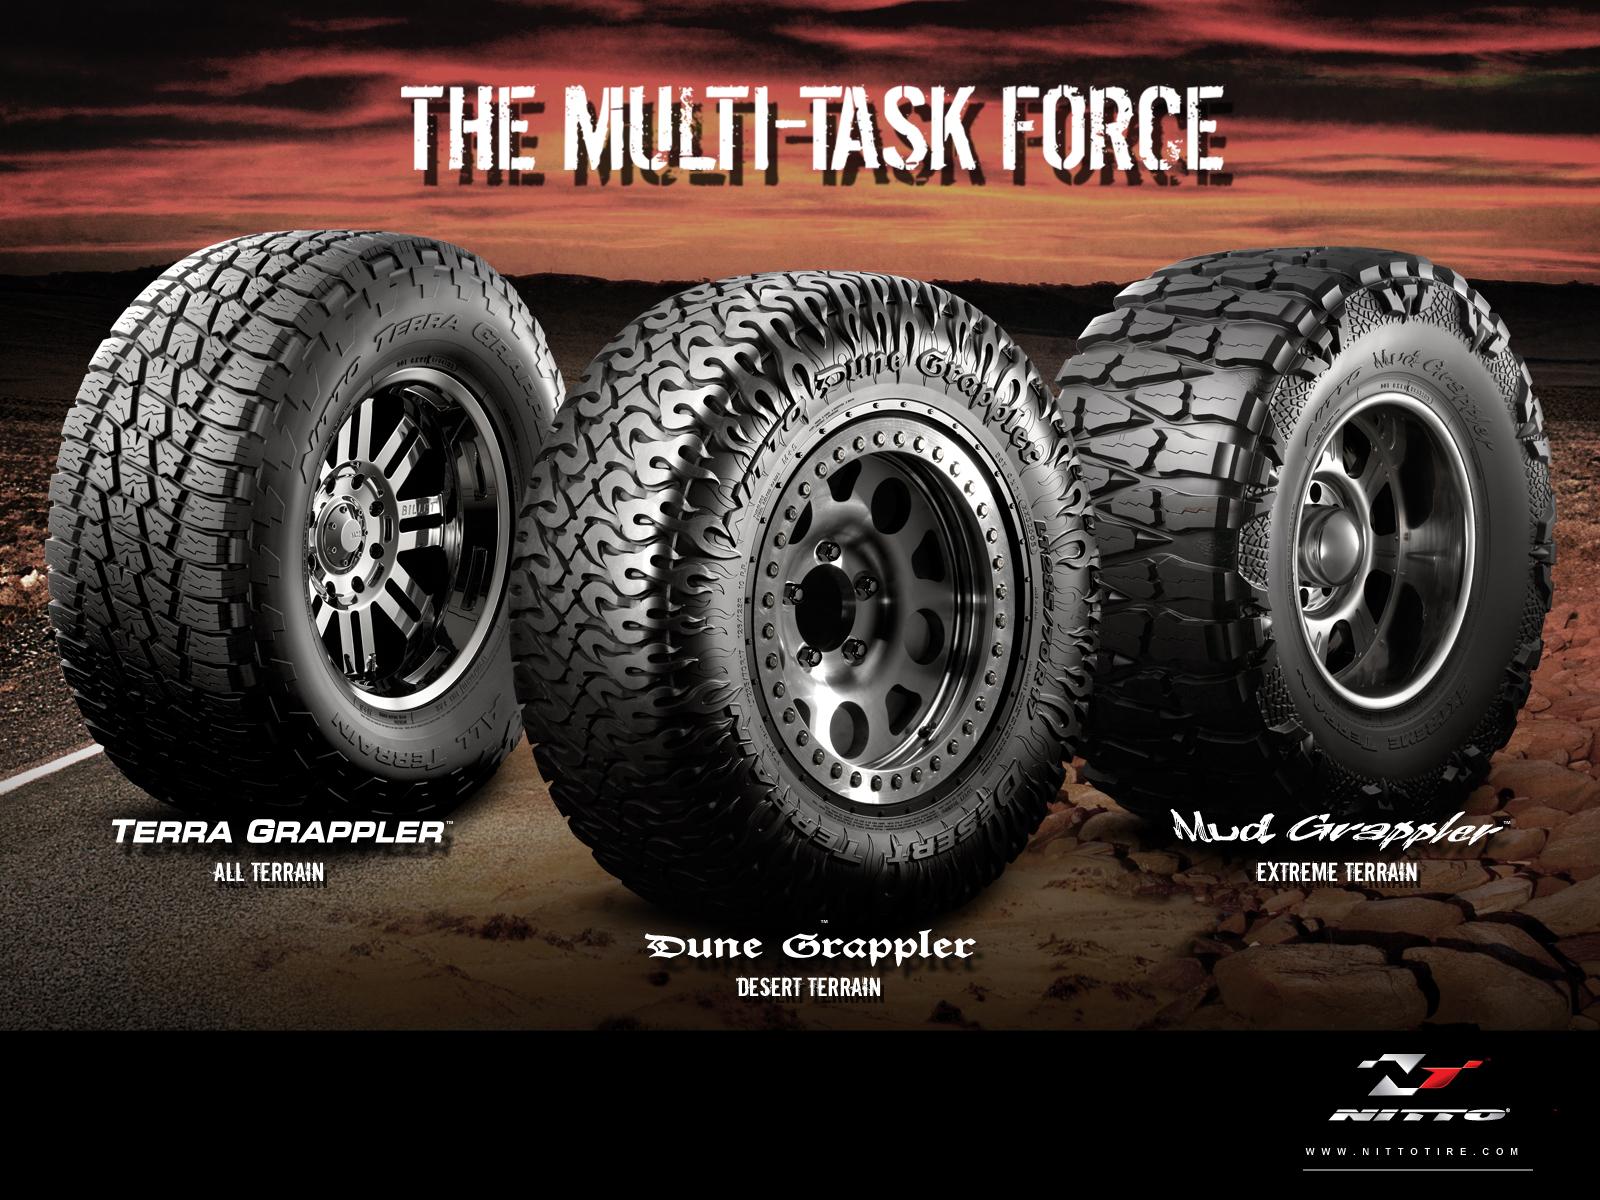 Nitto Multi-Task Force